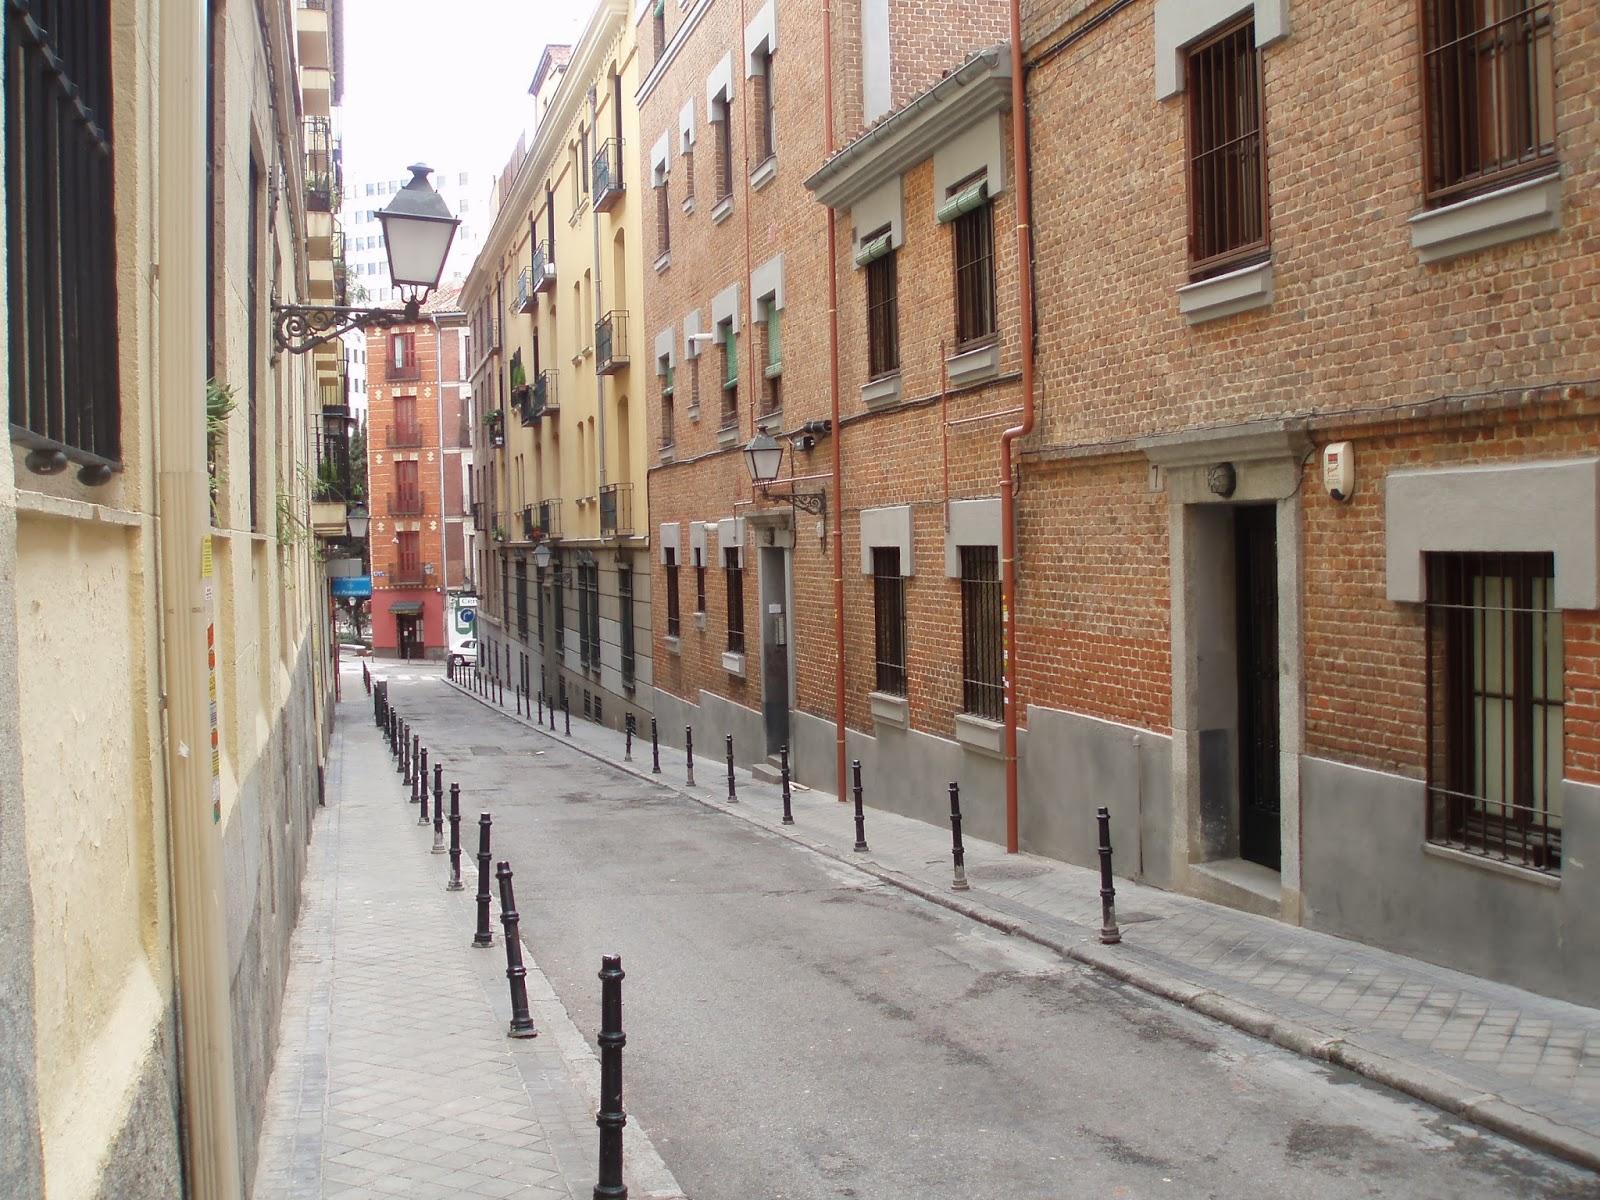 Calle de Manuel, Madrir